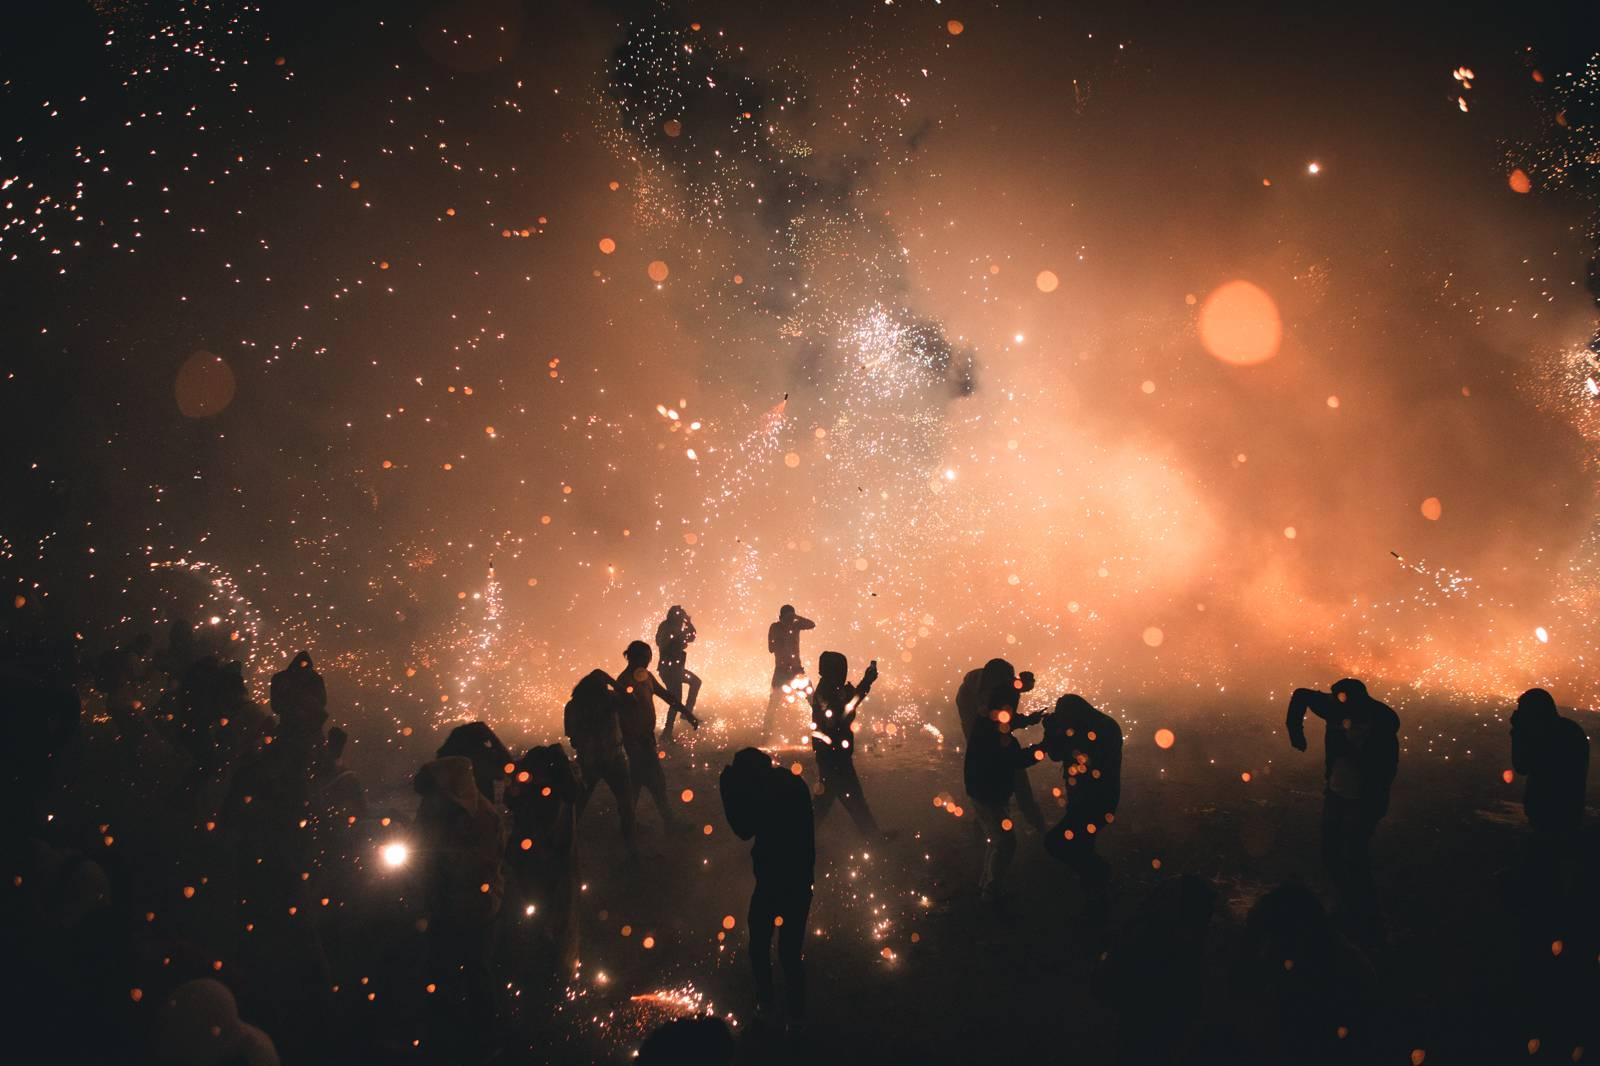 Mexico-Pyrotechnics-Dan-Medhurst-1660